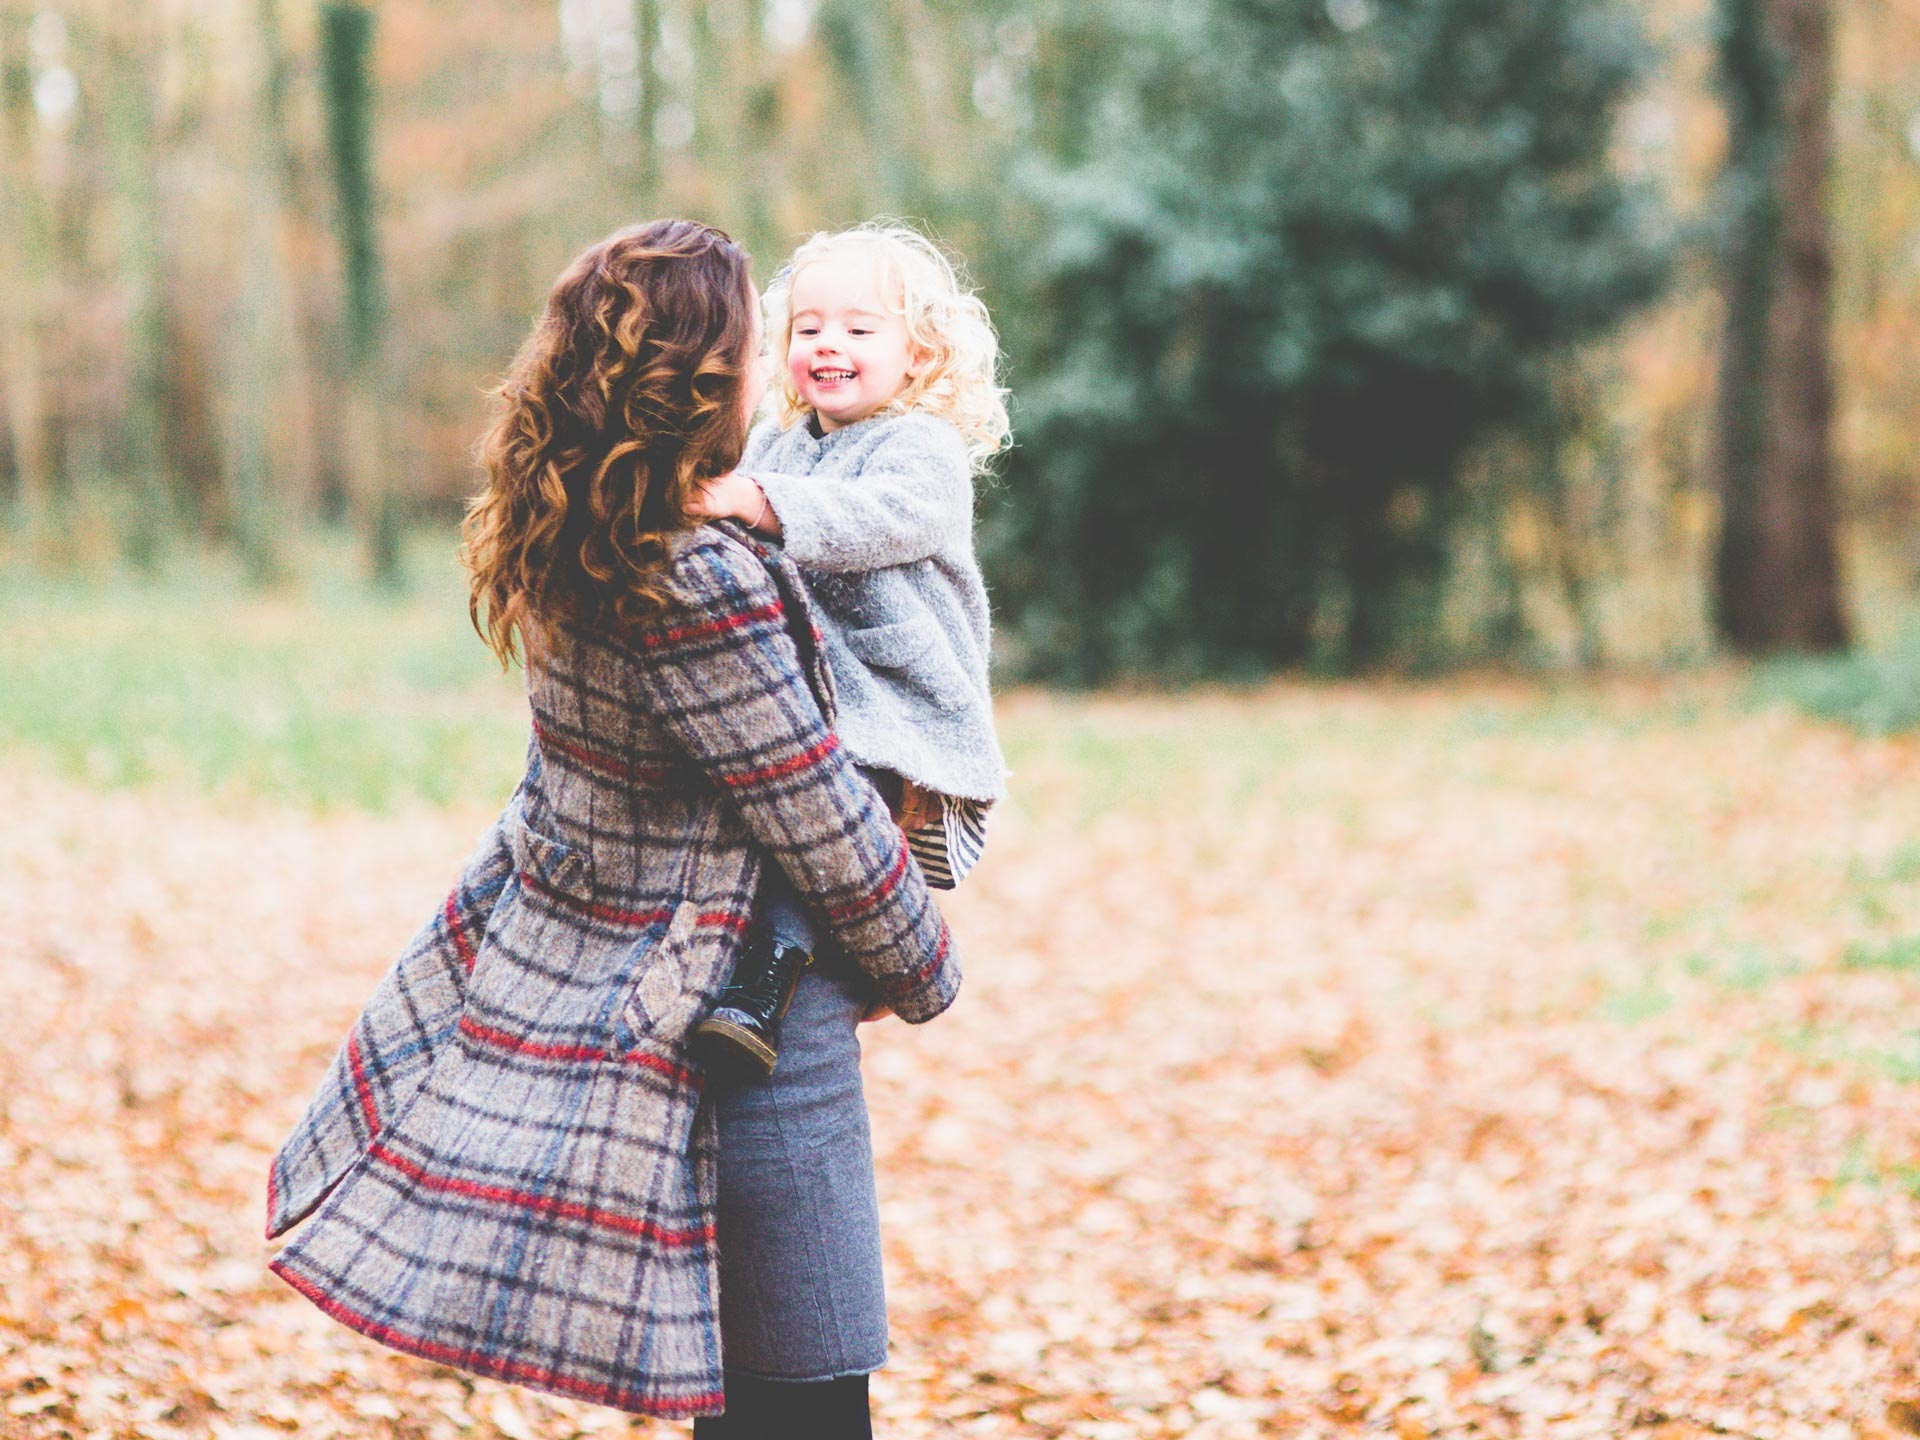 mama-lifestyle-blog-zsa-zsa-zsu-zwangerschapsshoot-123